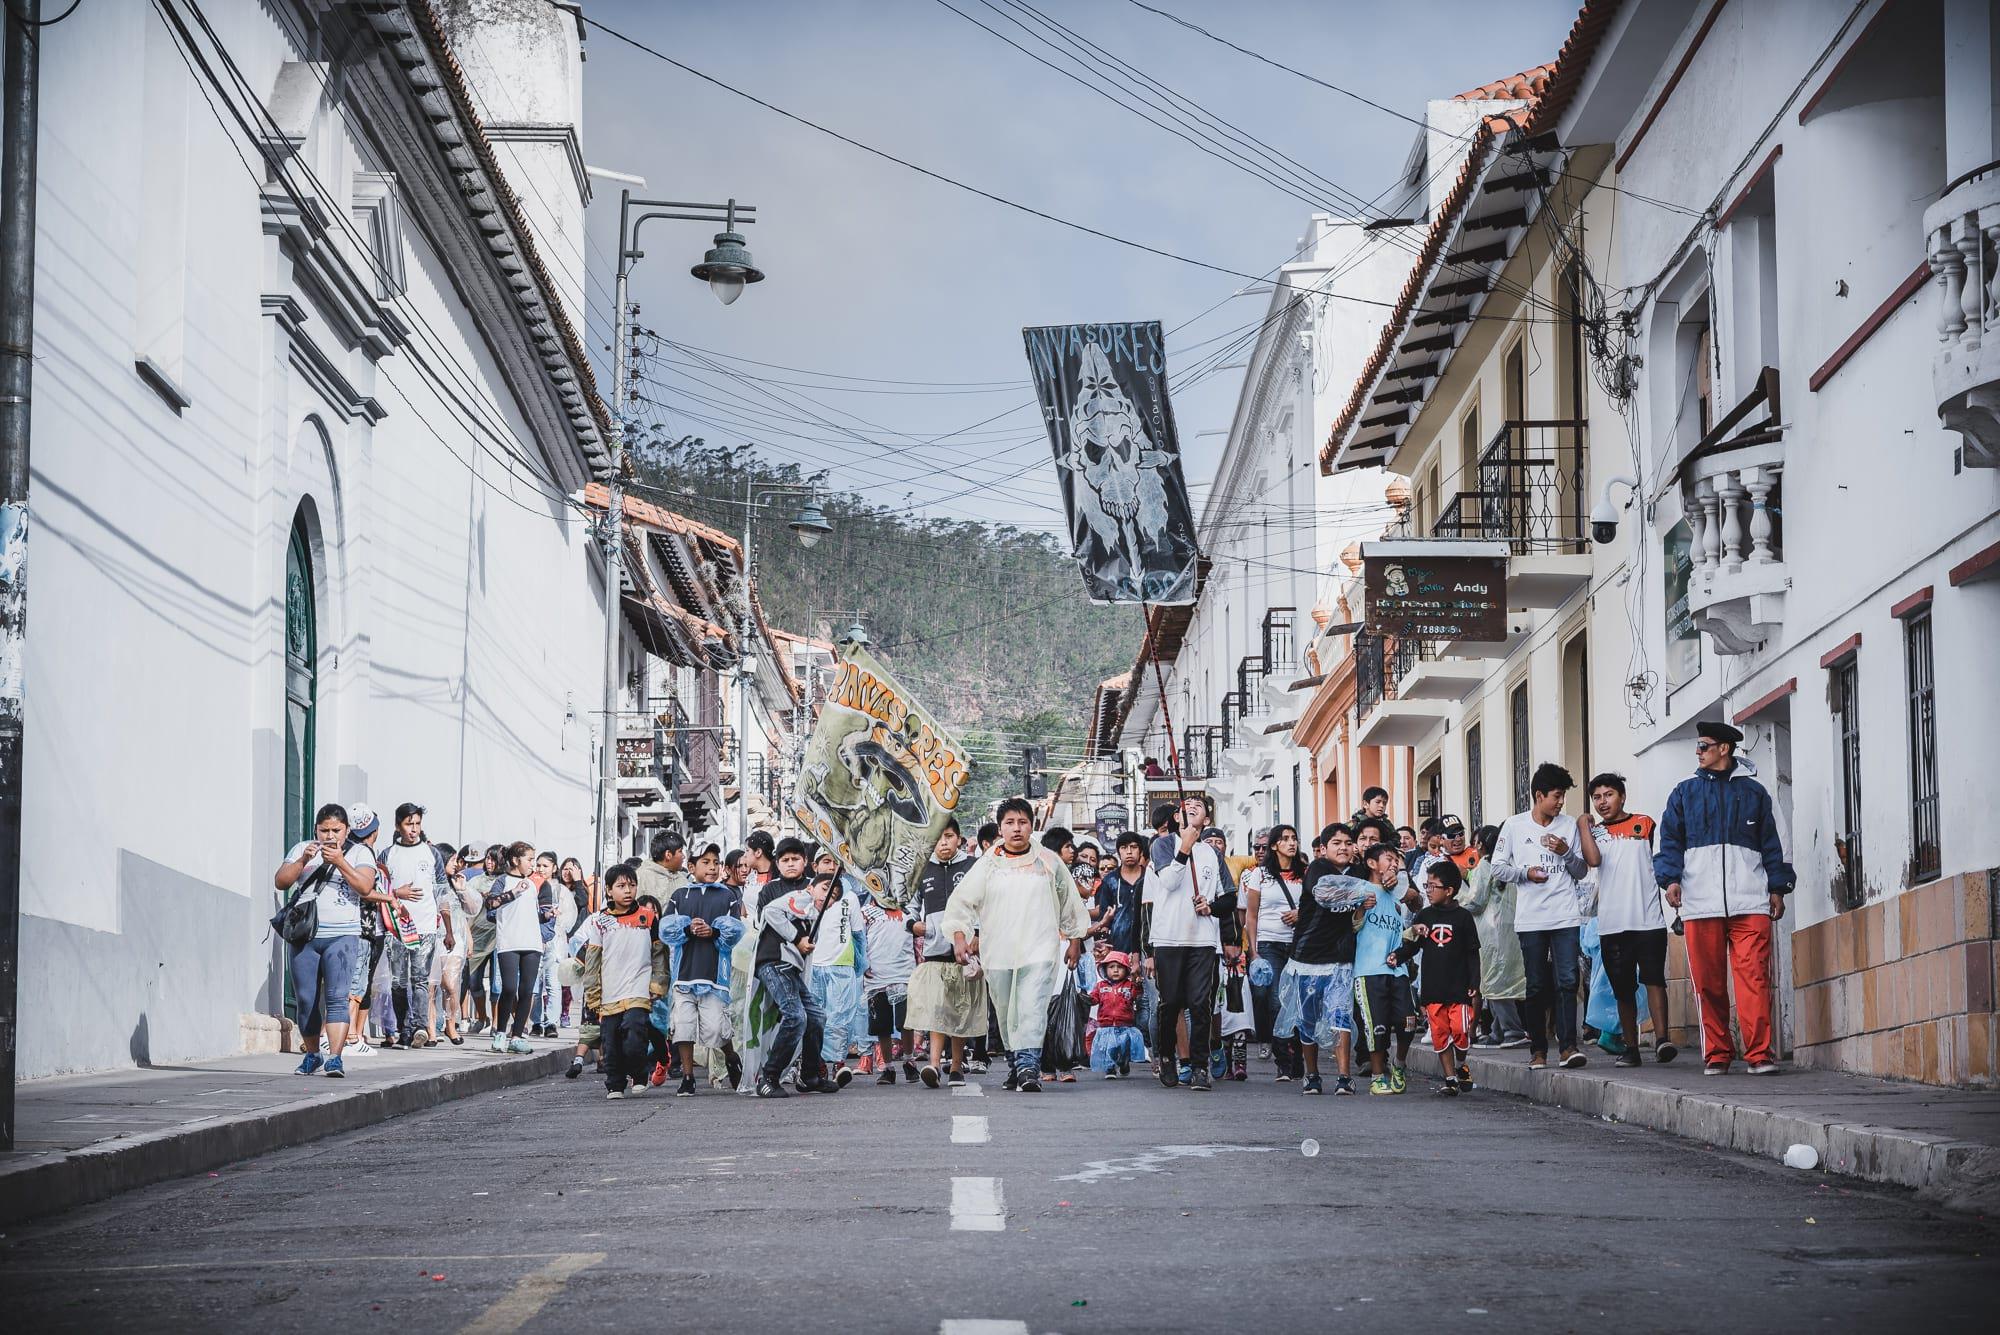 bolivien-portrait-waltsmedia-südamerika-lateinamerika-29